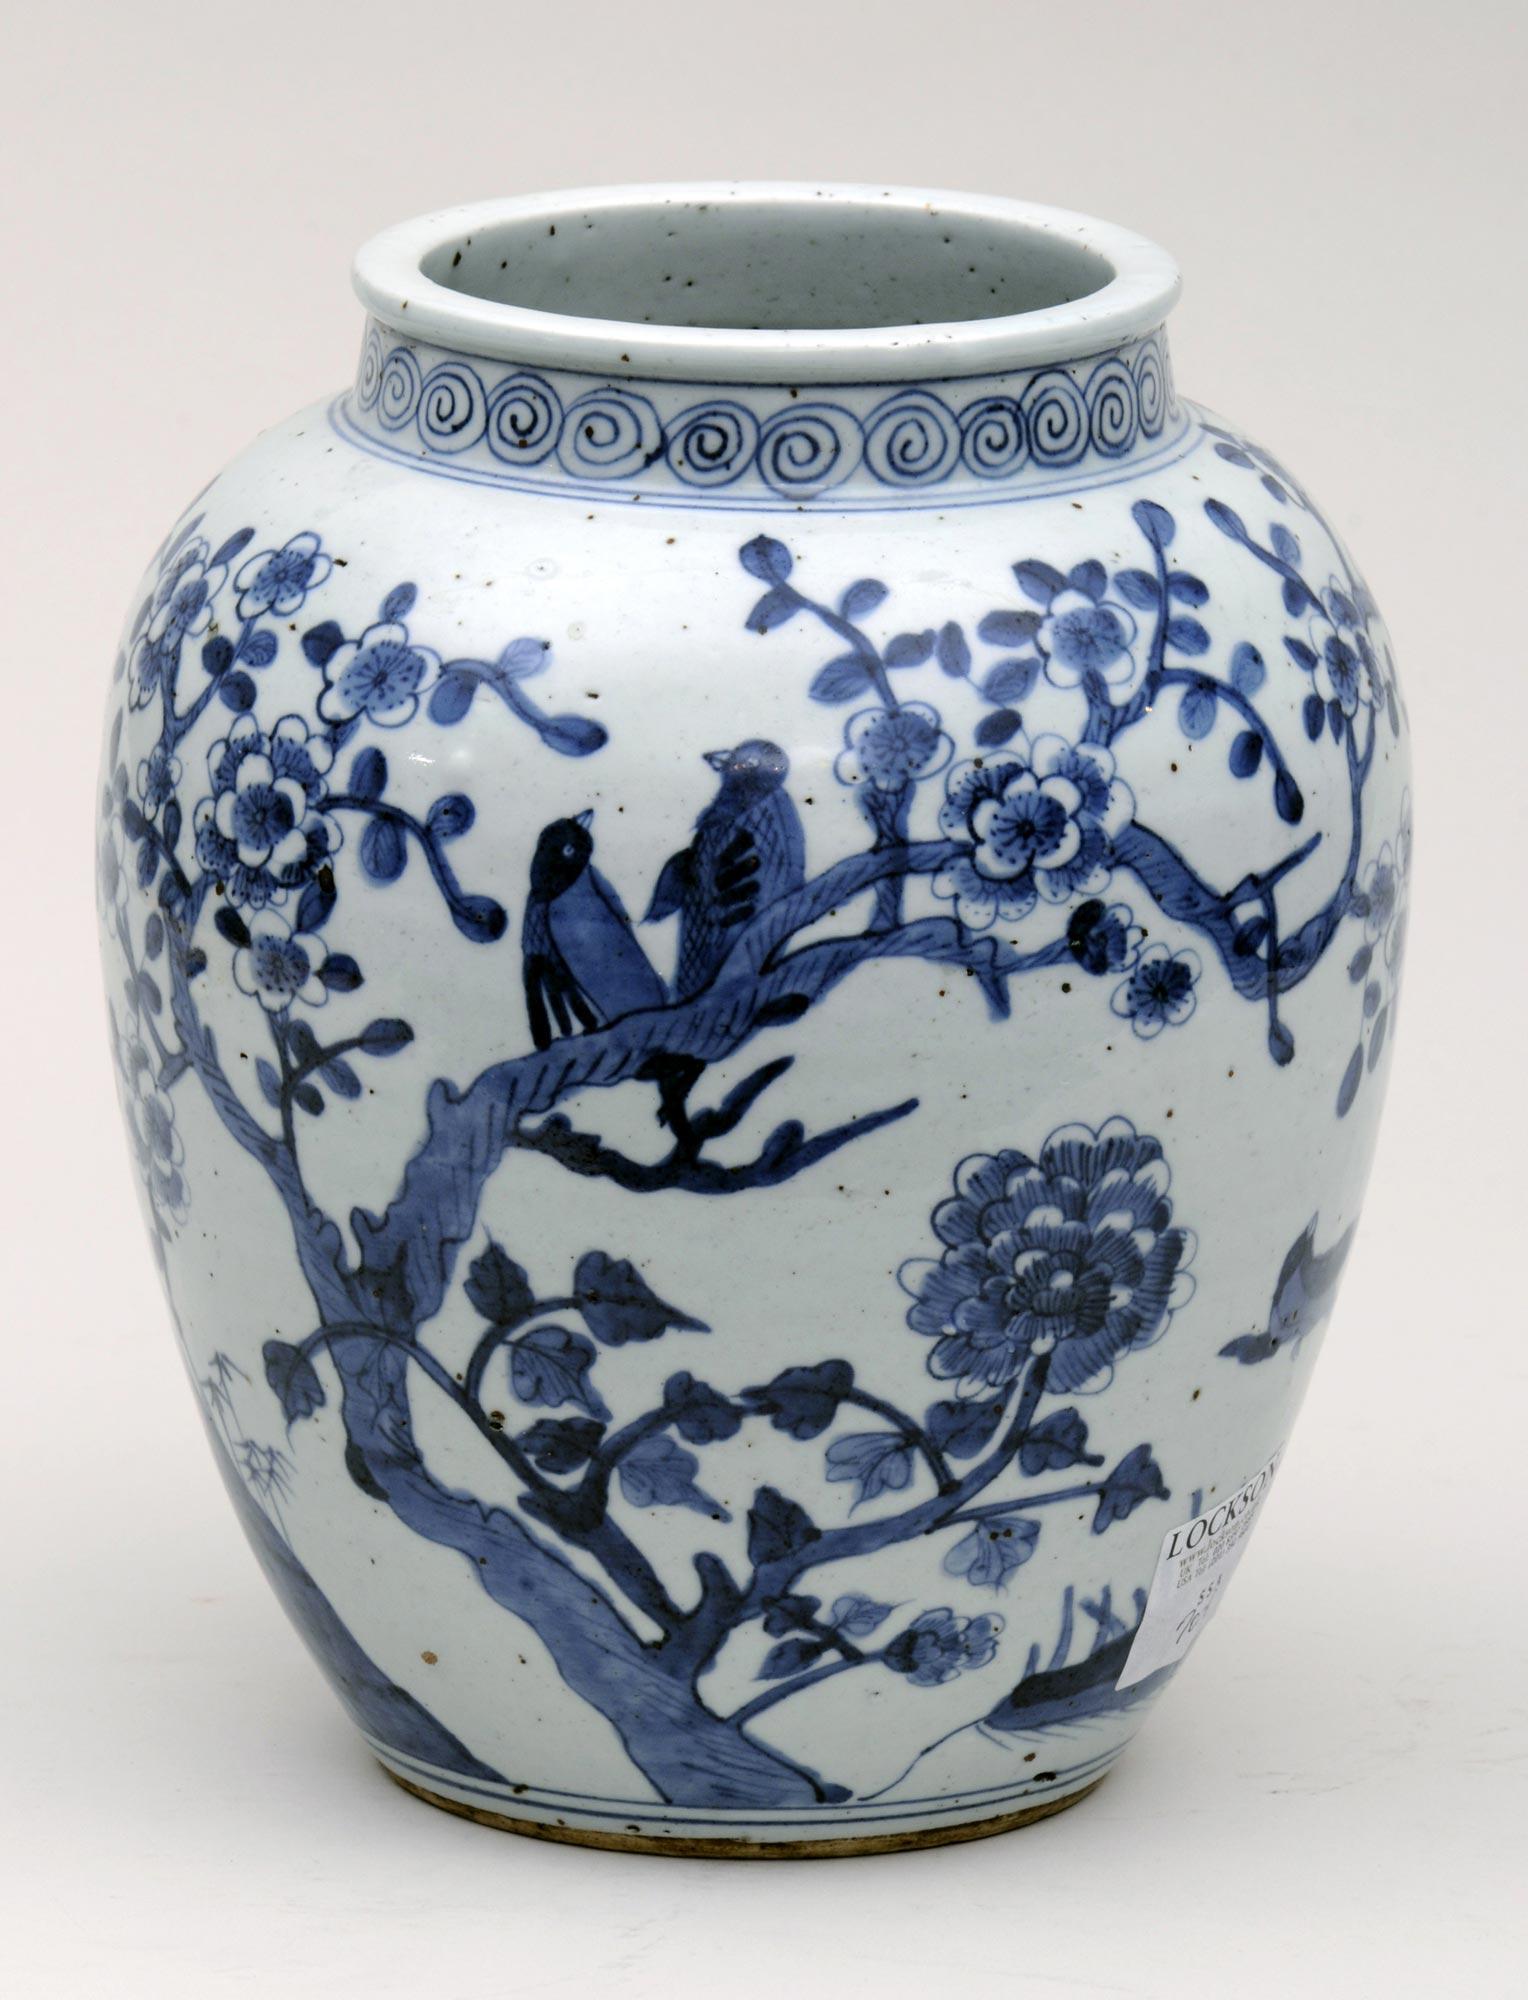 chinese shunzhi blue and white vase 1644 1661. Black Bedroom Furniture Sets. Home Design Ideas